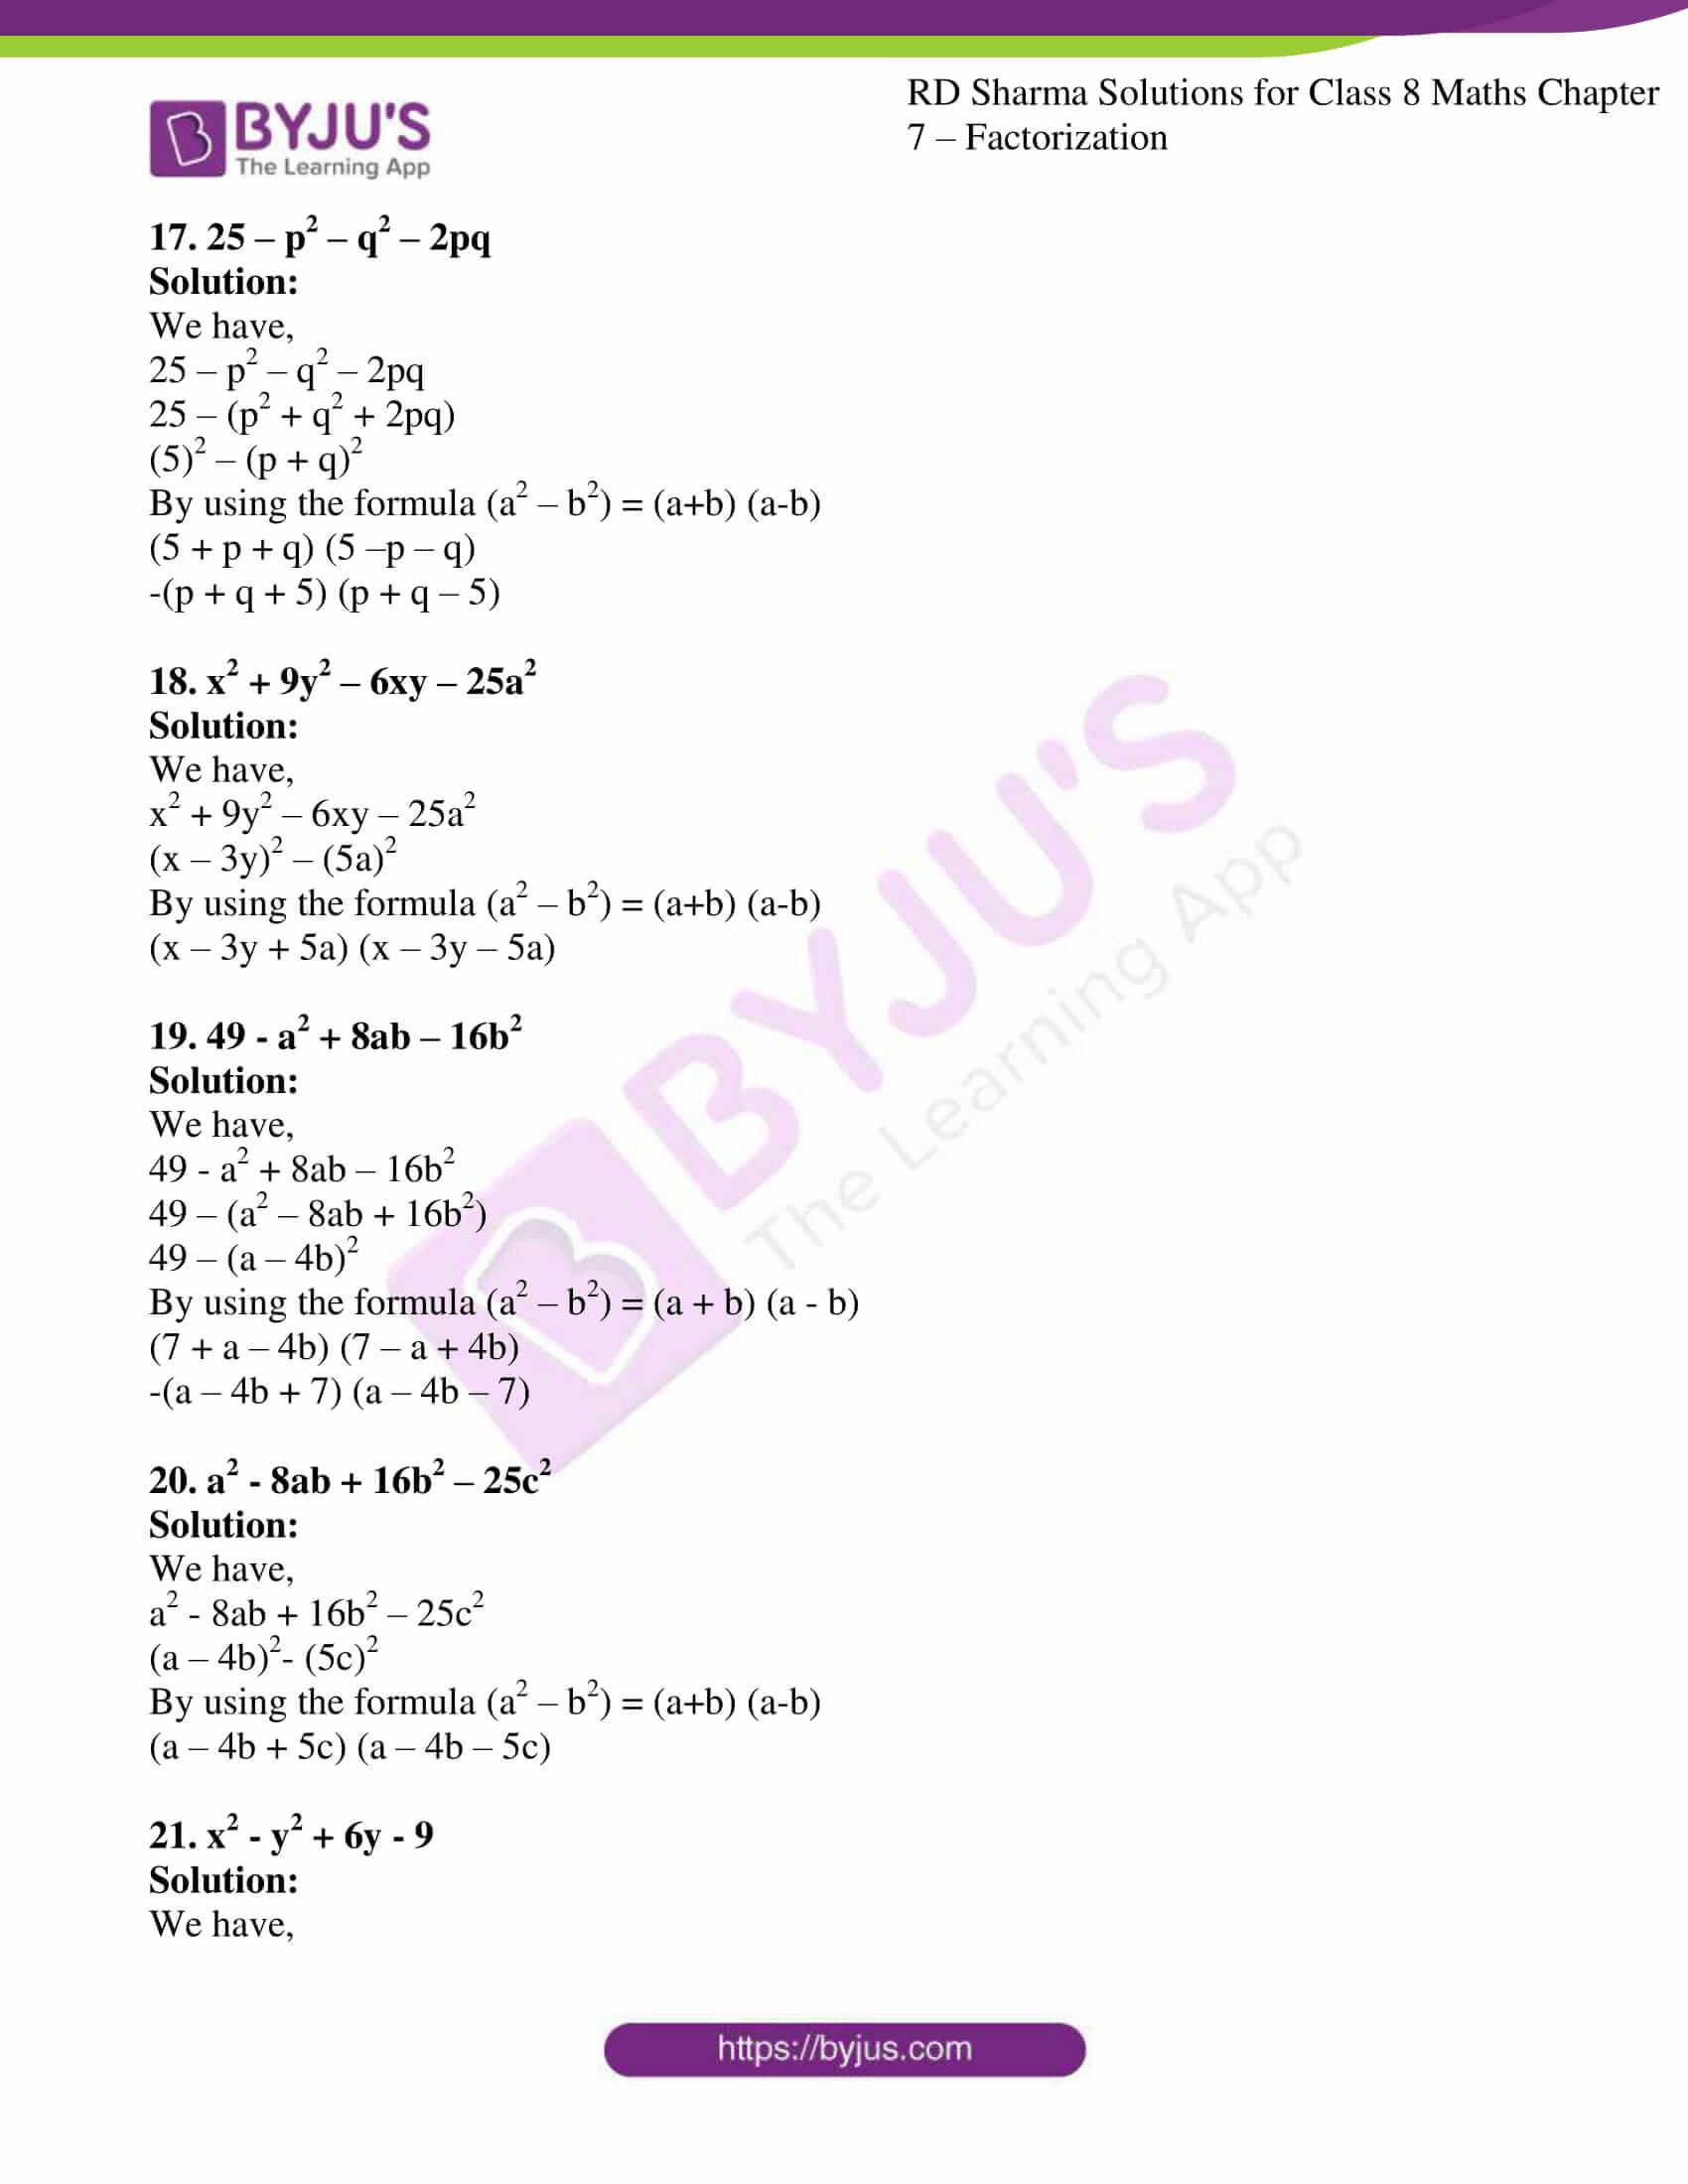 rd sharma class 8 maths chapter 7 exercise 6 5